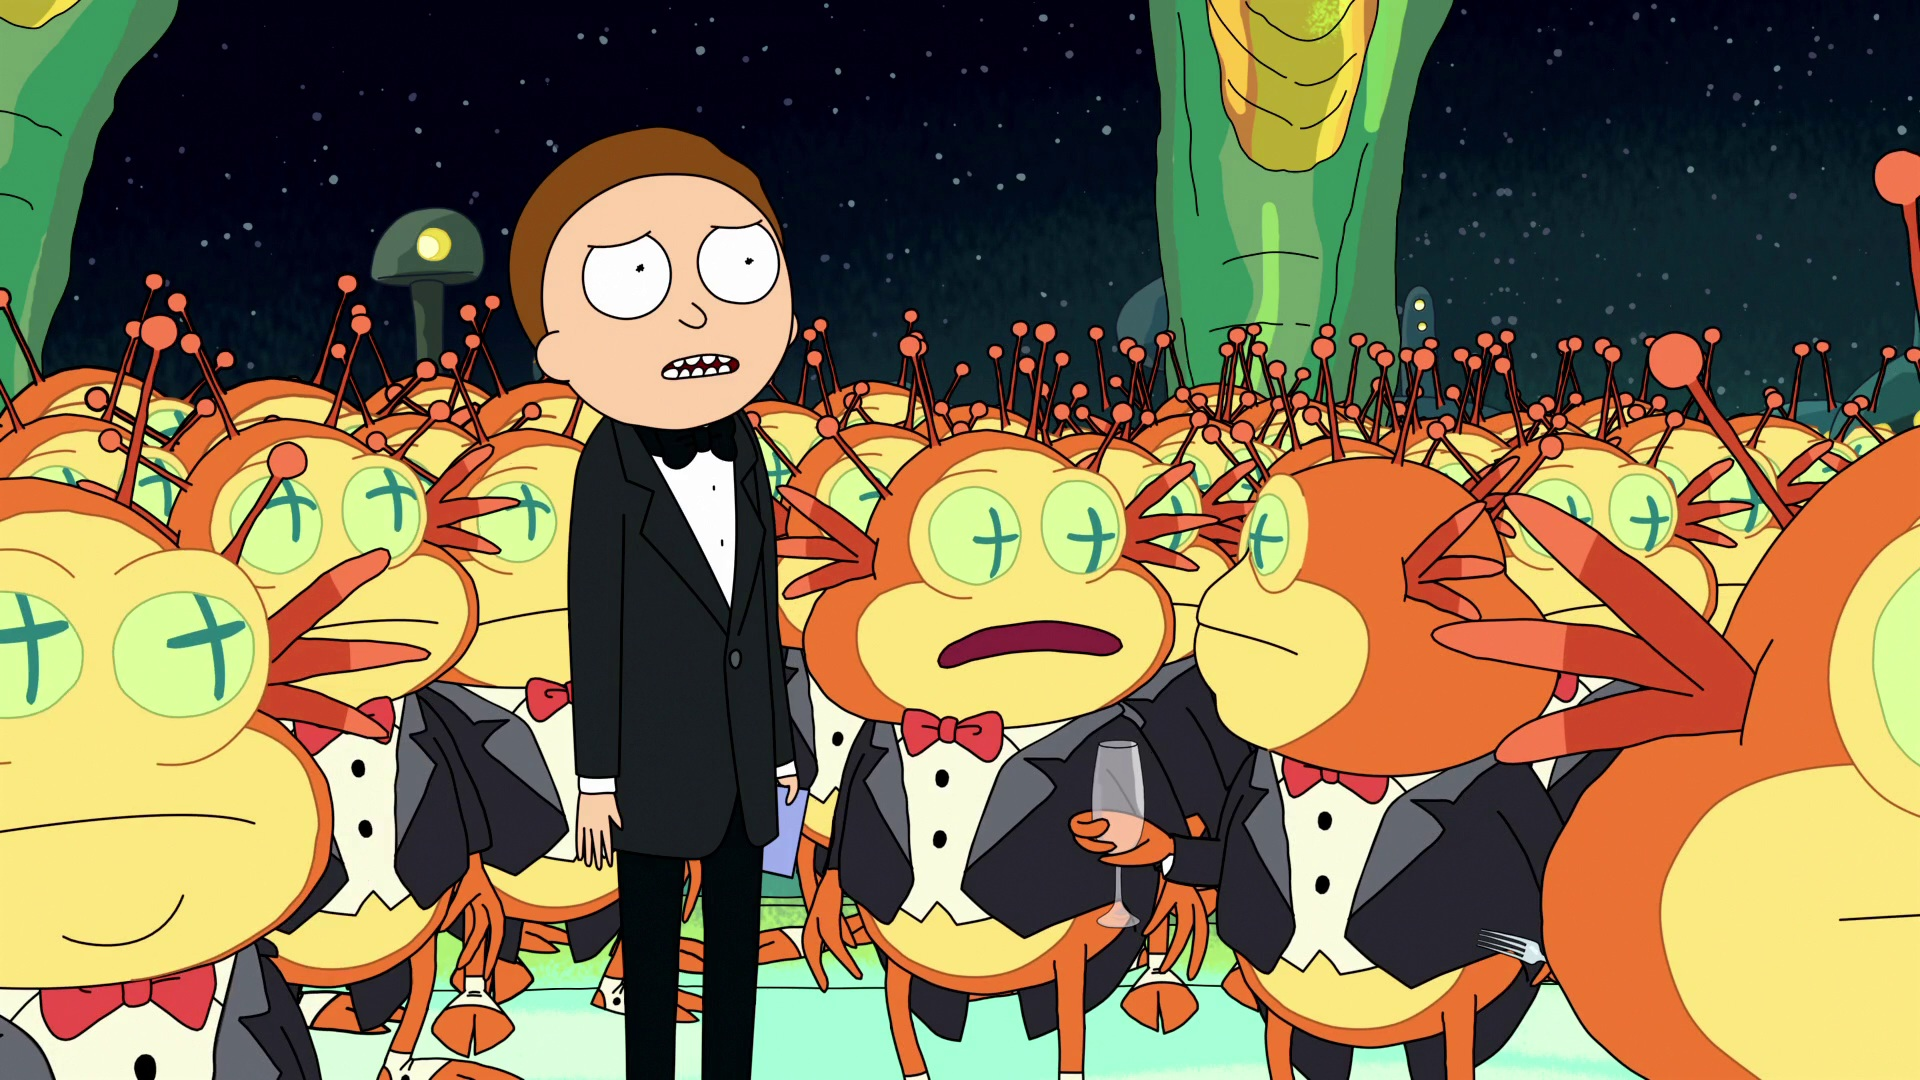 Rick and Morty Рик и Морти рик и морти   сообщество